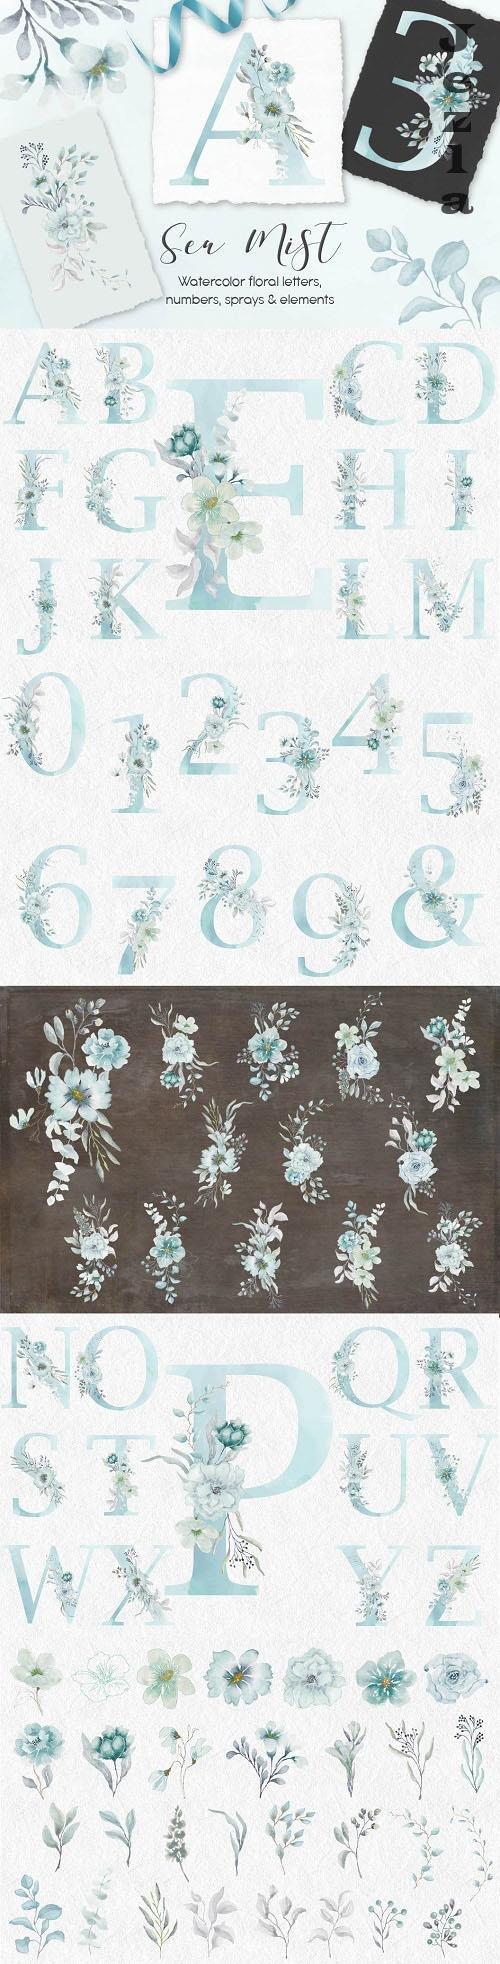 Sea Mist watercolor alphabet - 6221625